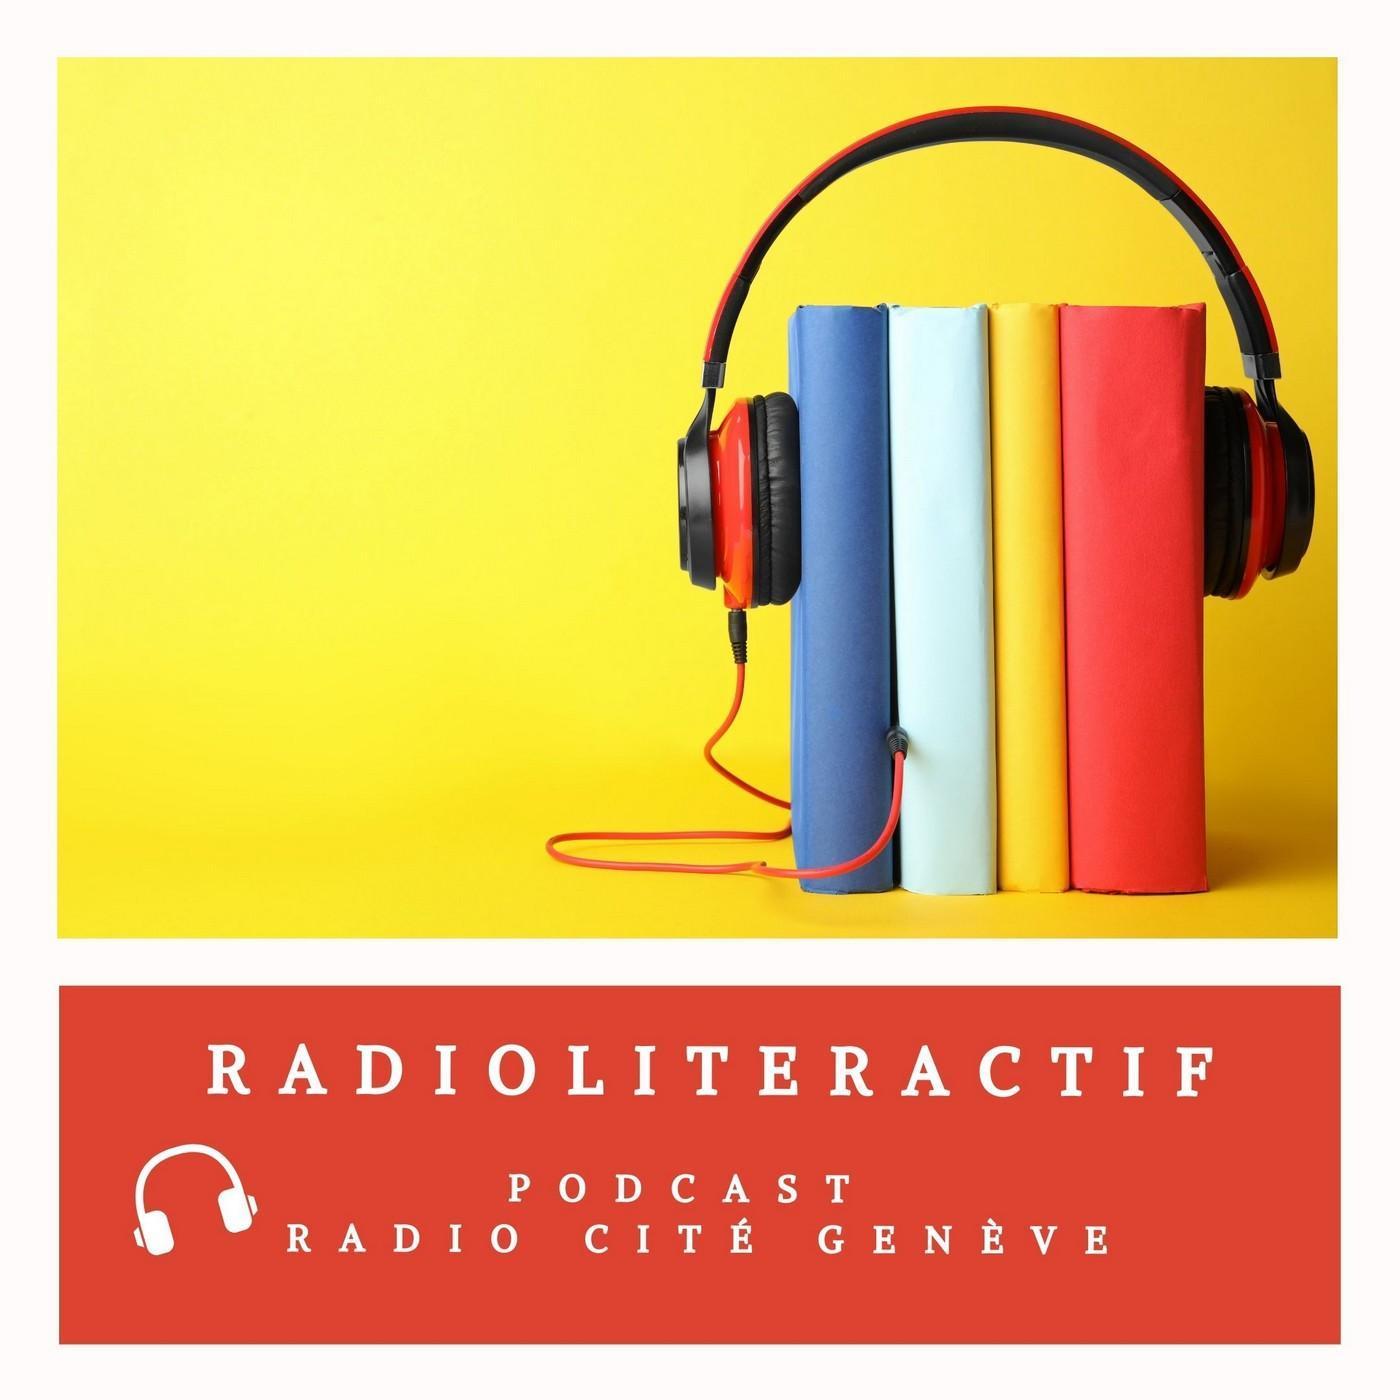 Radioliteractif du 17/05/2021 - Alain Bagnoud